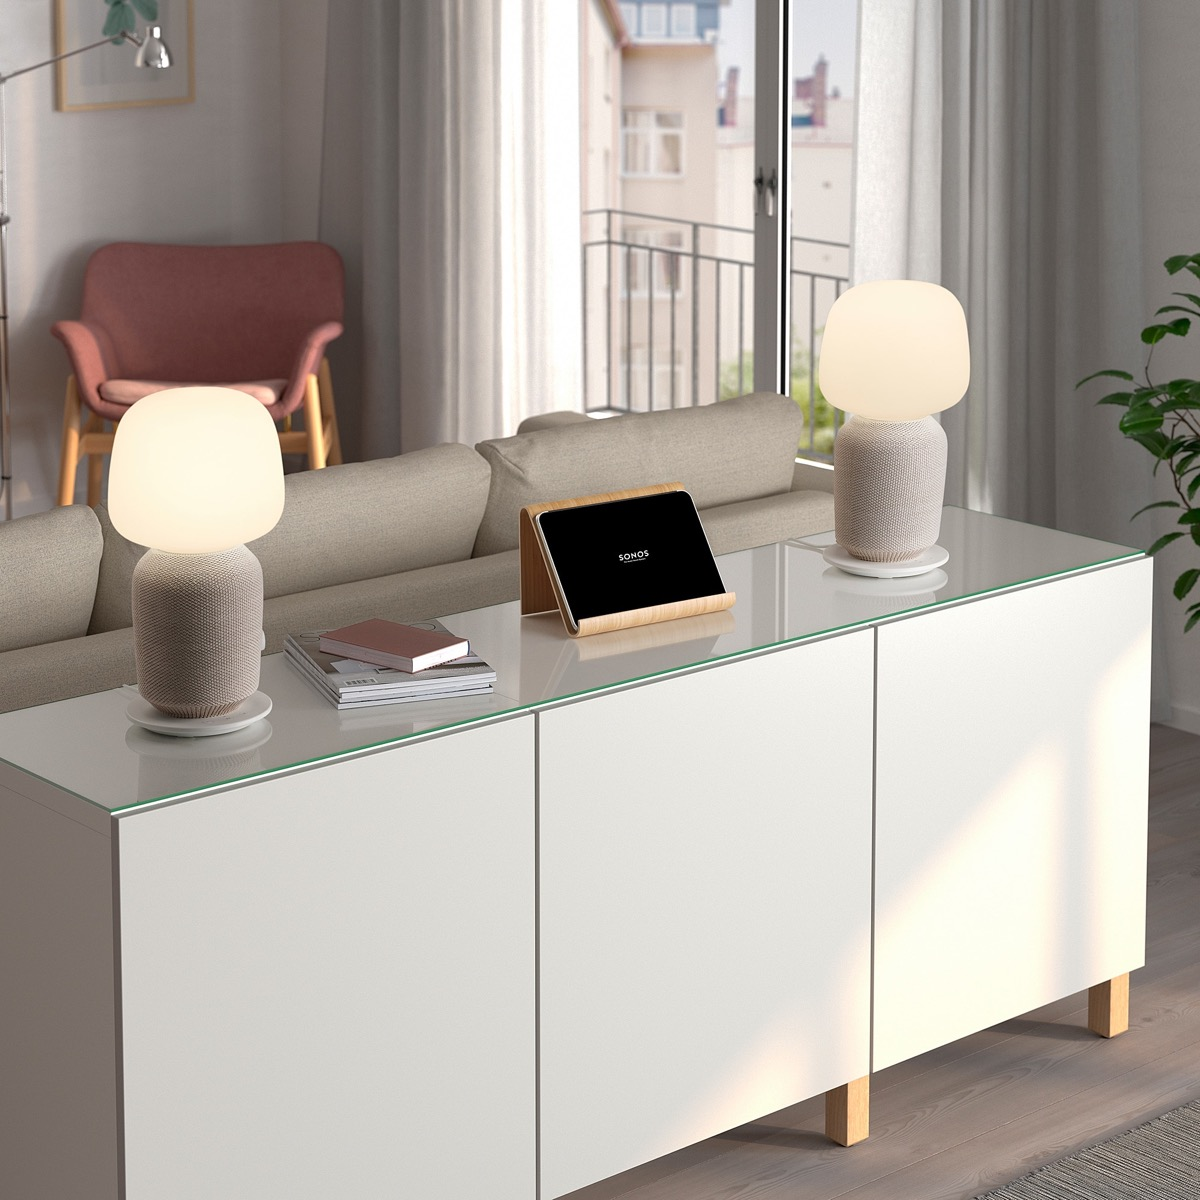 IKEA lampada symfonisk